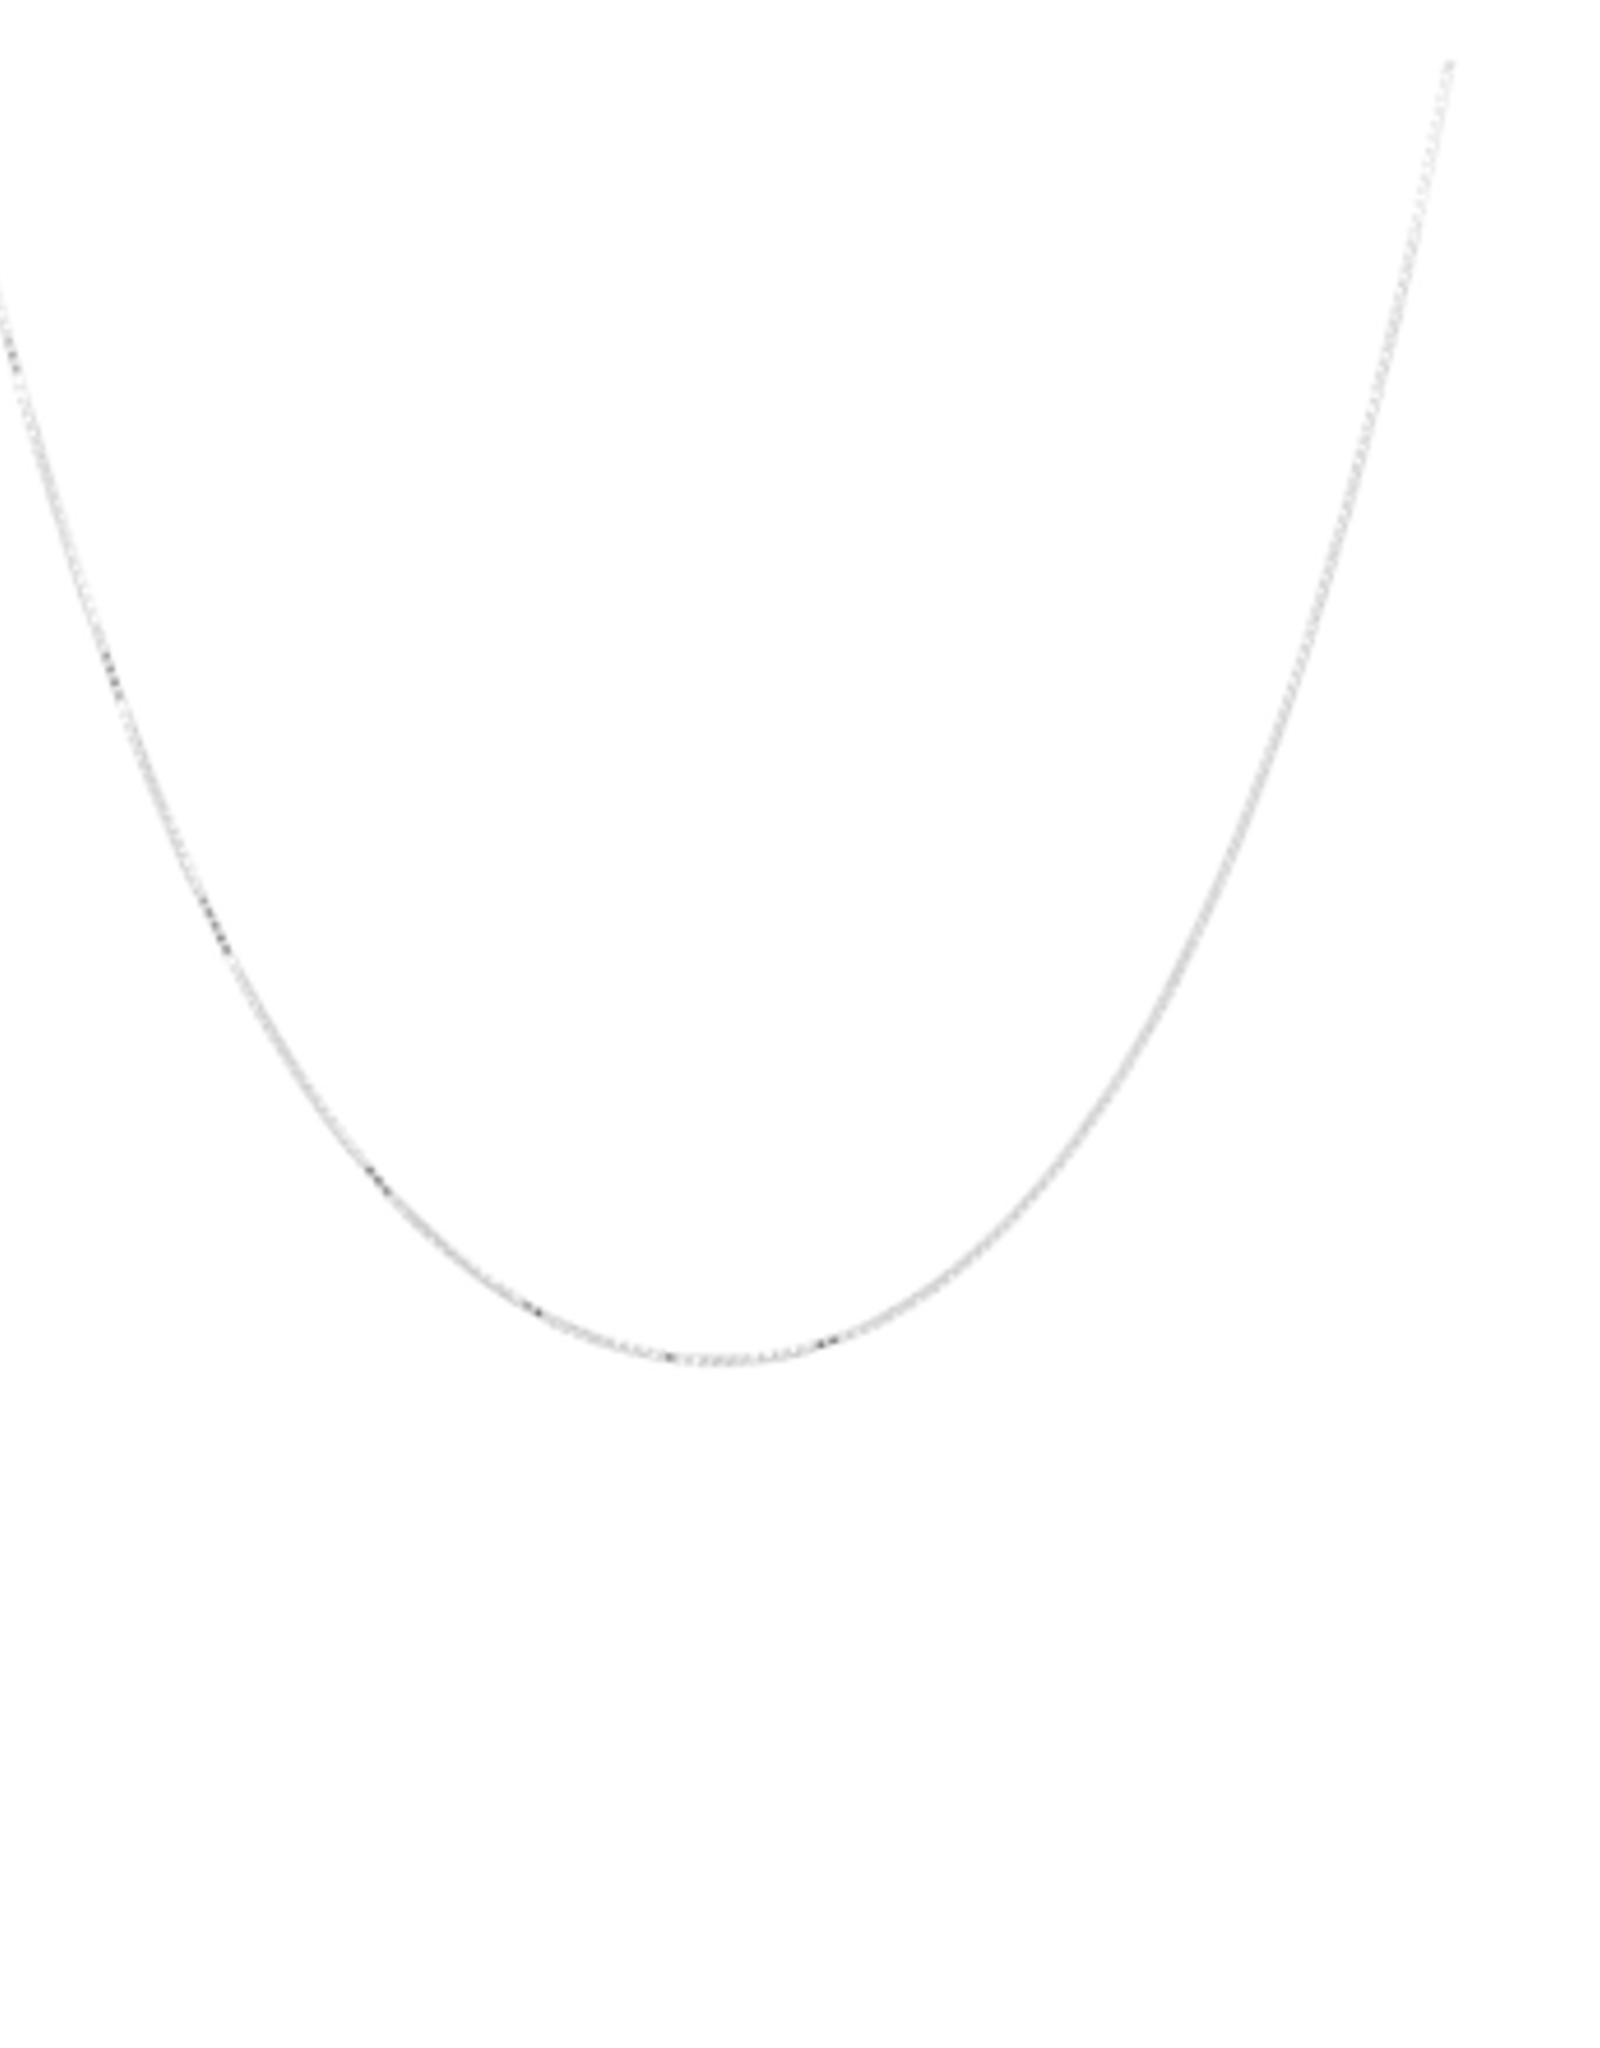 Anna + Nina Anna + Nina square plain necklace short silver